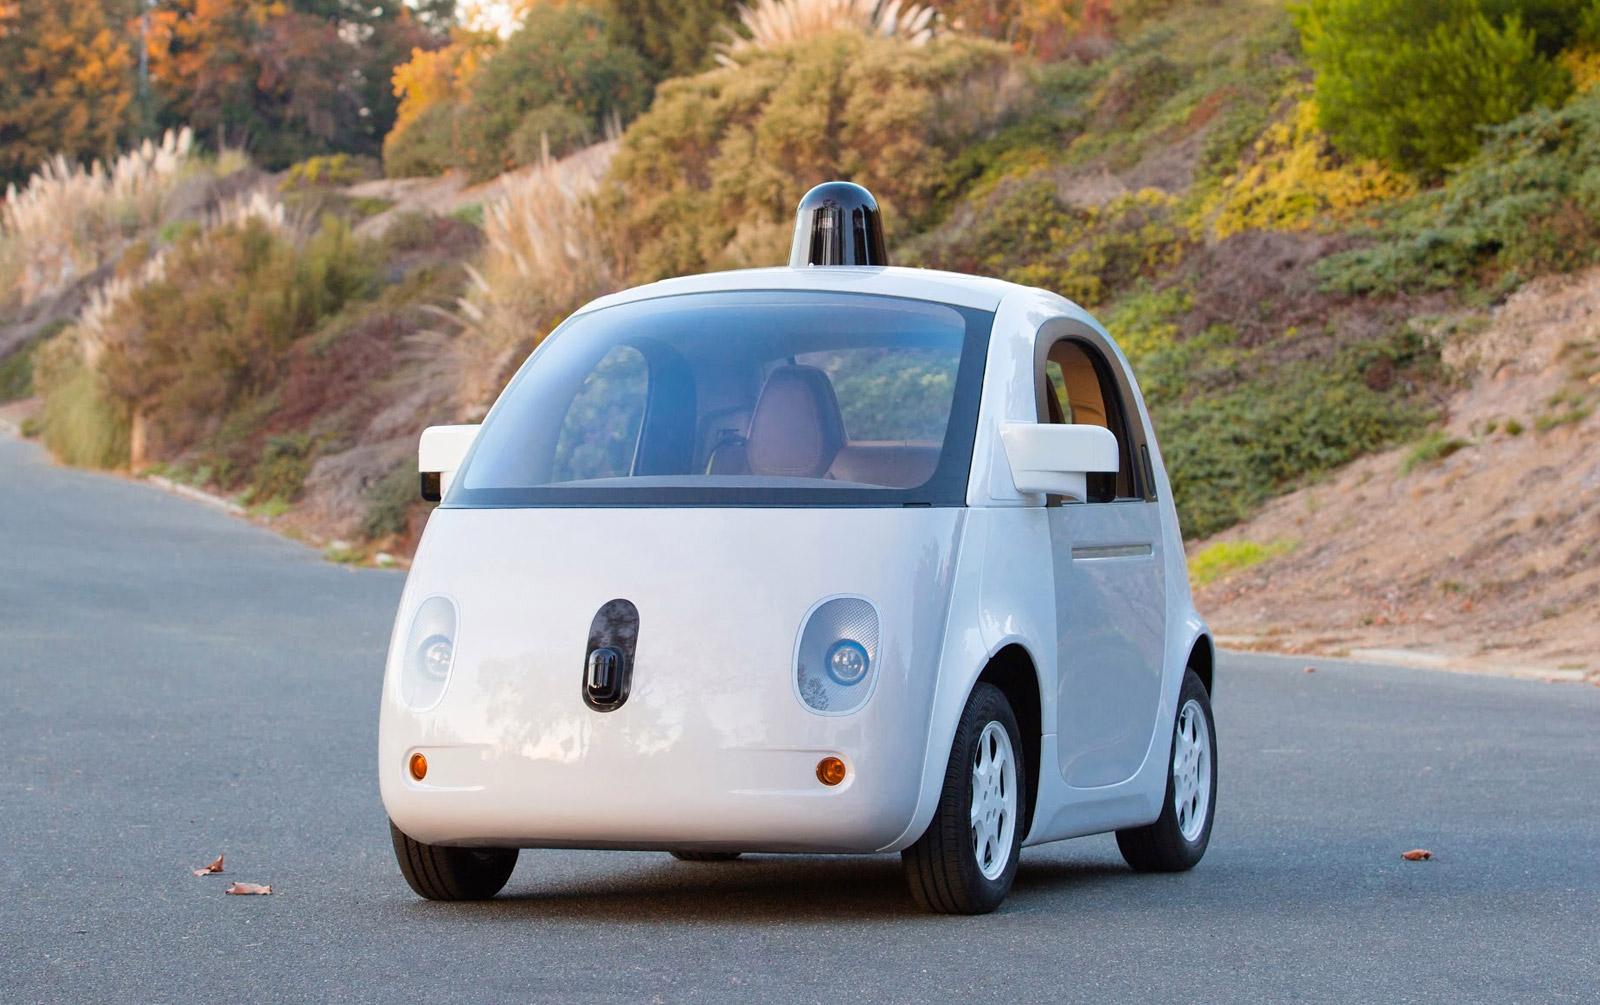 Superfast Internet Will Bring Car Automation | Financial Tribune